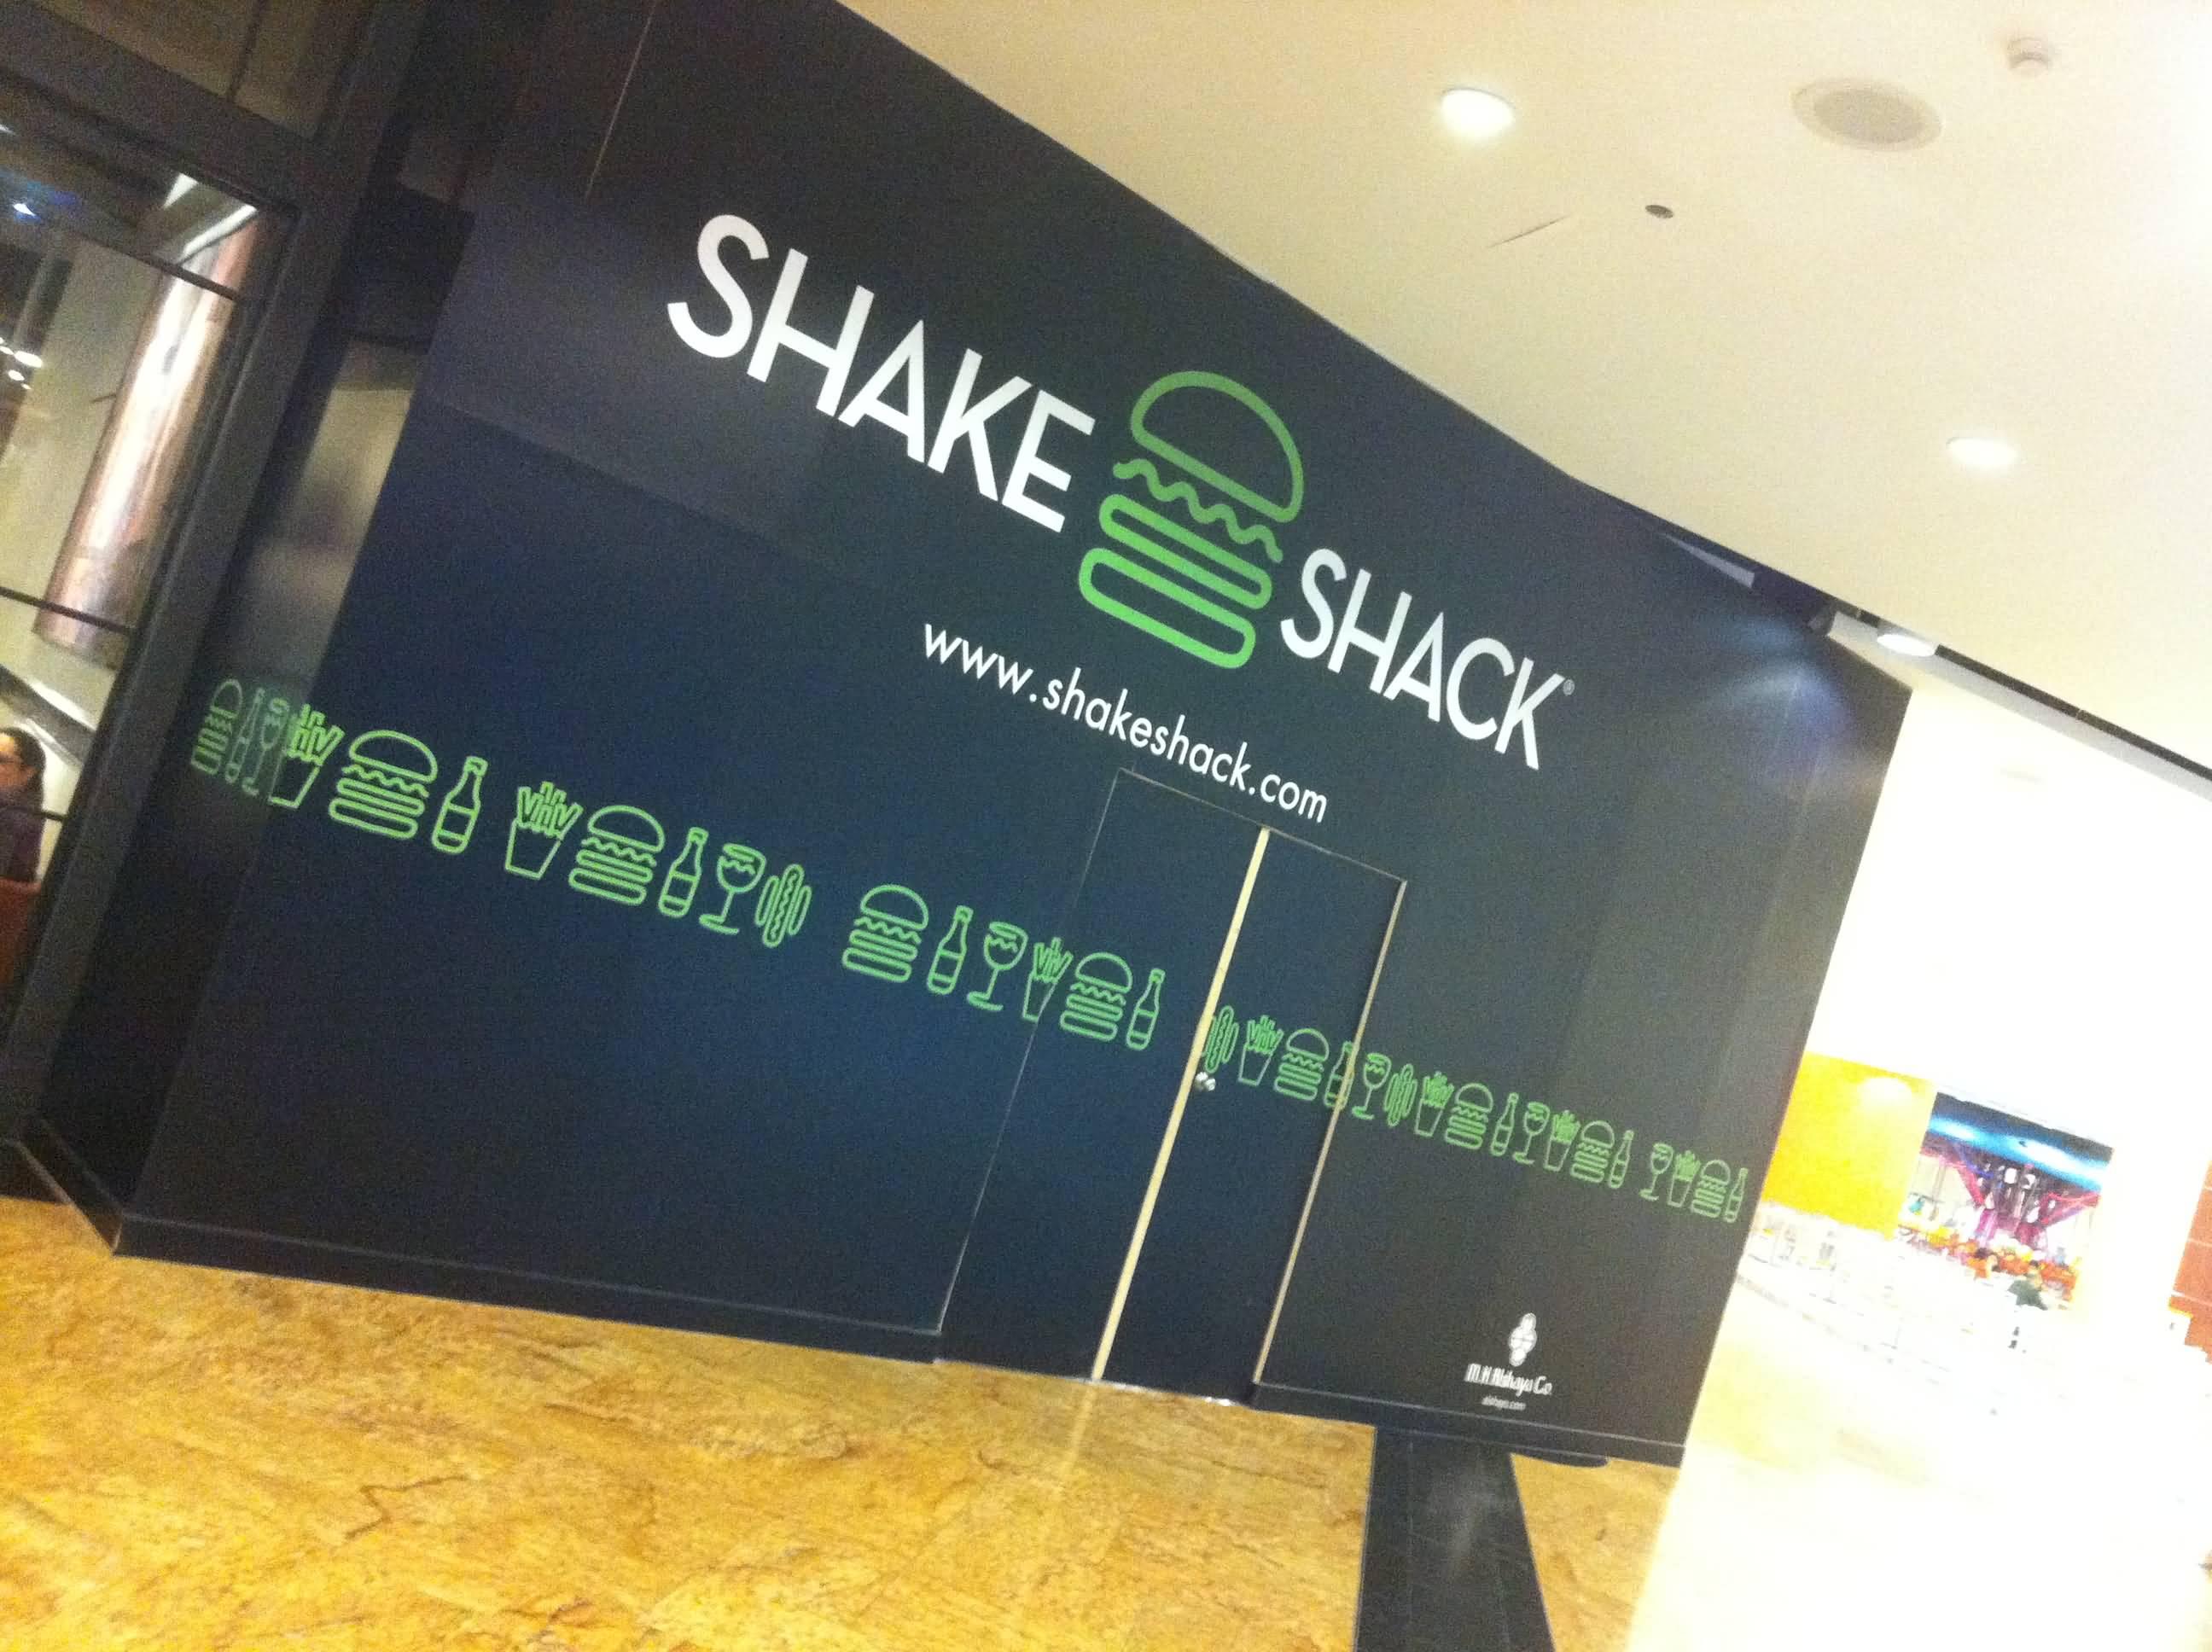 Photo of مطعم شيك شاك يتعاون مع فنانيين تشكيليين محليين لتحويل فروعه الى أماكن إبداعية